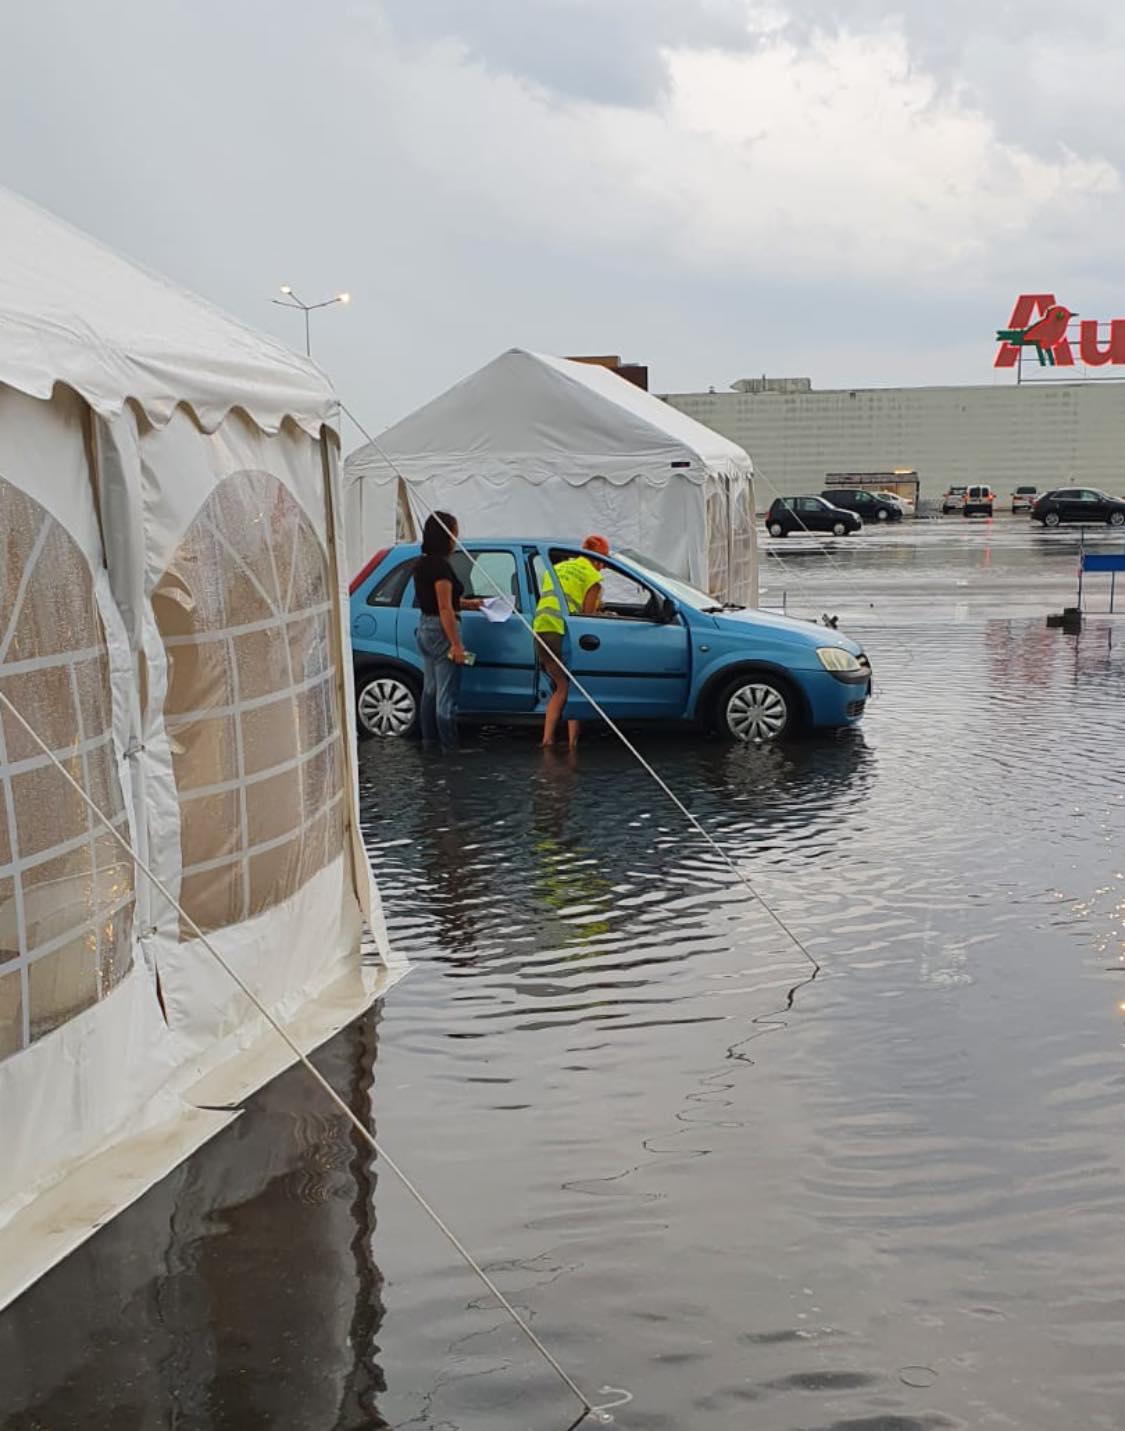 Inundatii la drive-thru în Deva